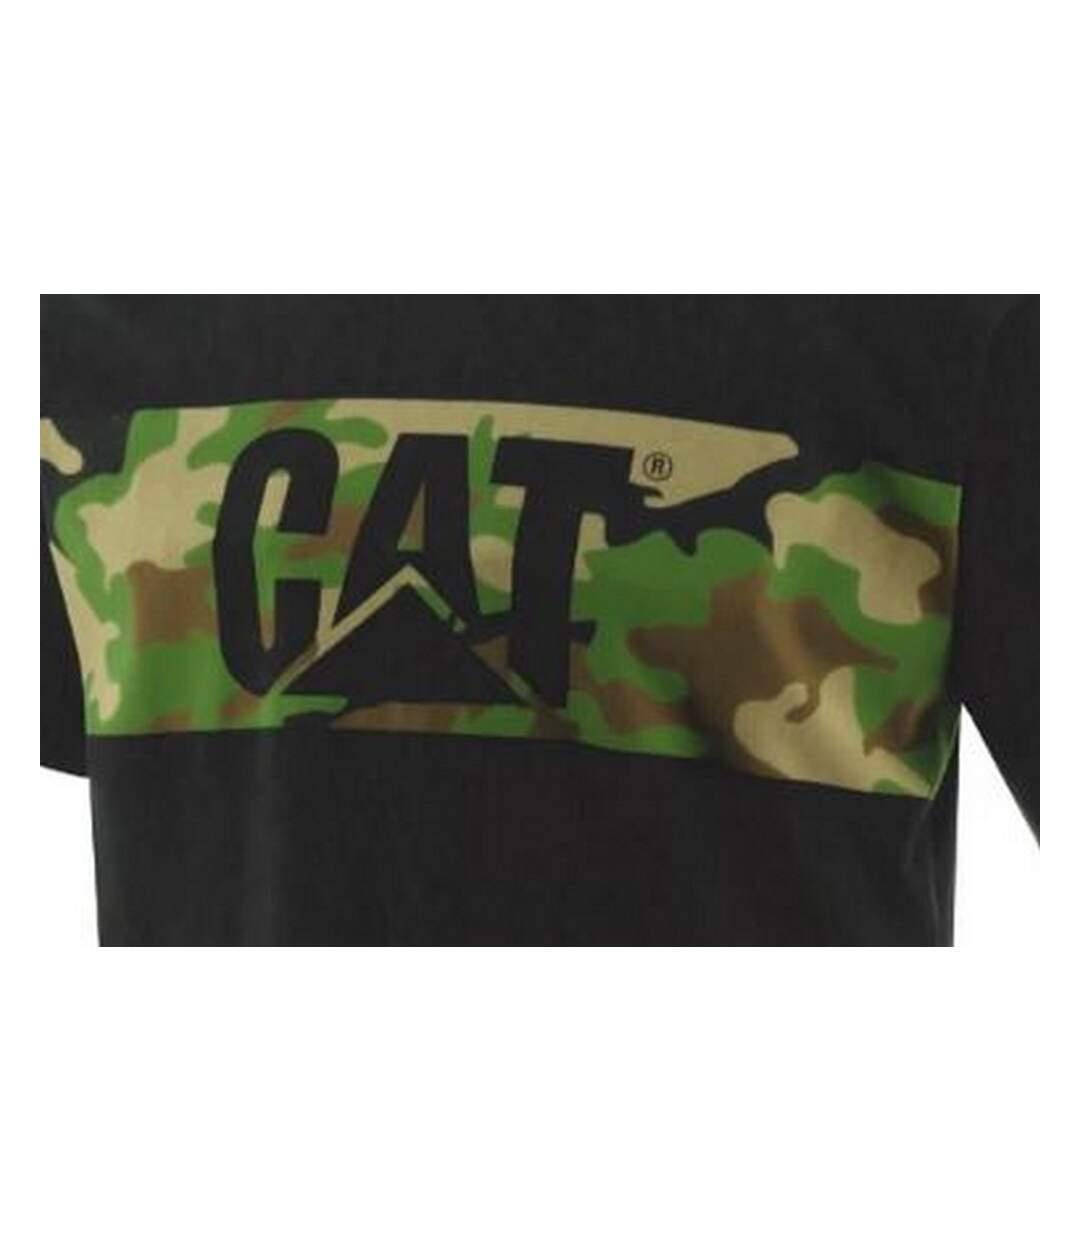 Caterpillar Mens Camo Print Tee (Black/Camo) - UTFS7135